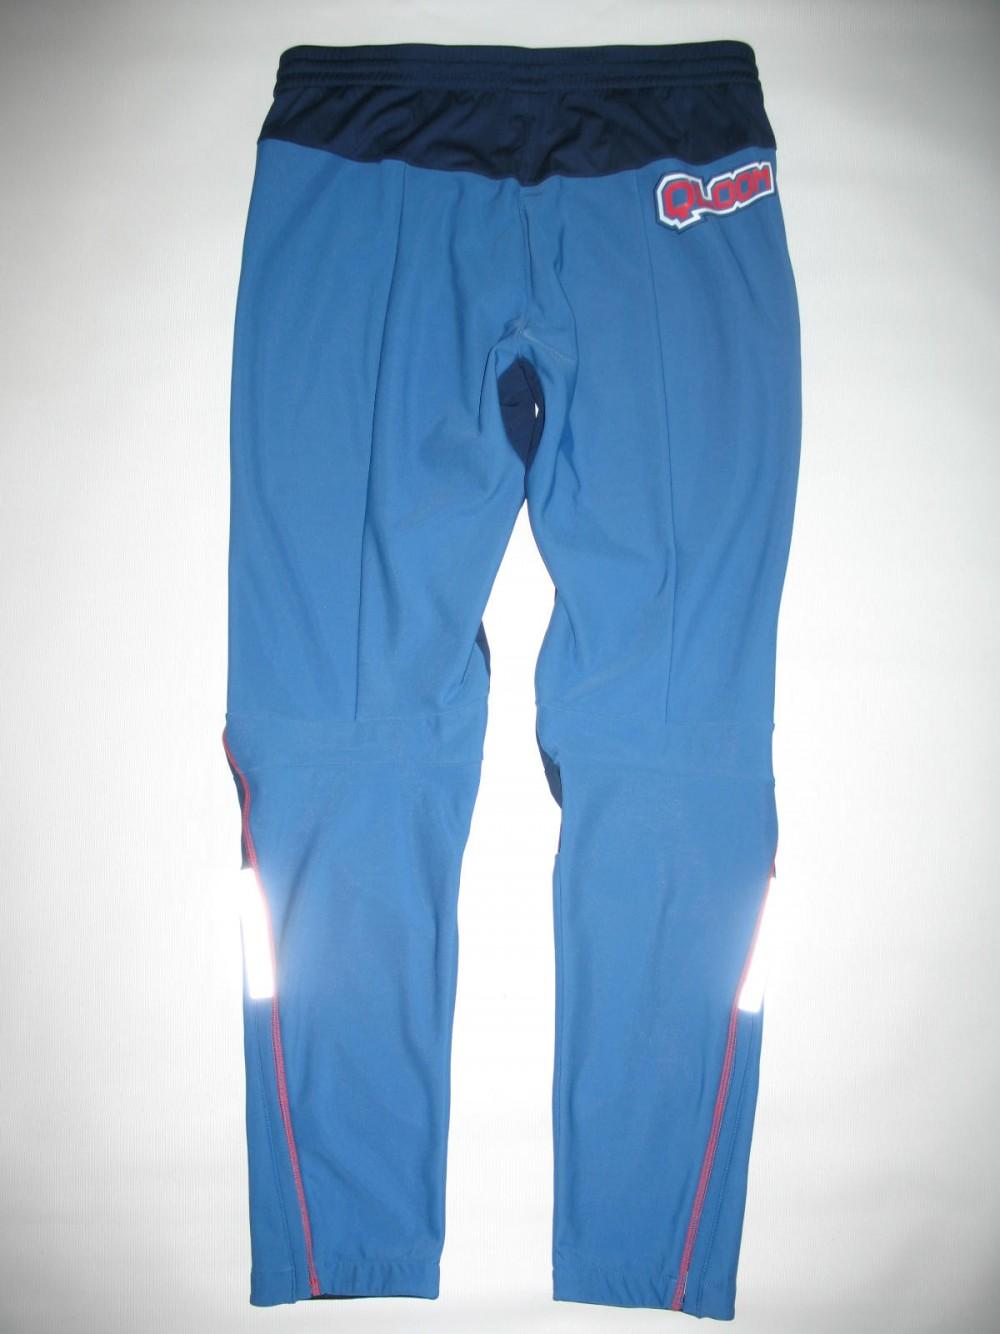 Штаны QLOOM big sky pants (размер L) - 2